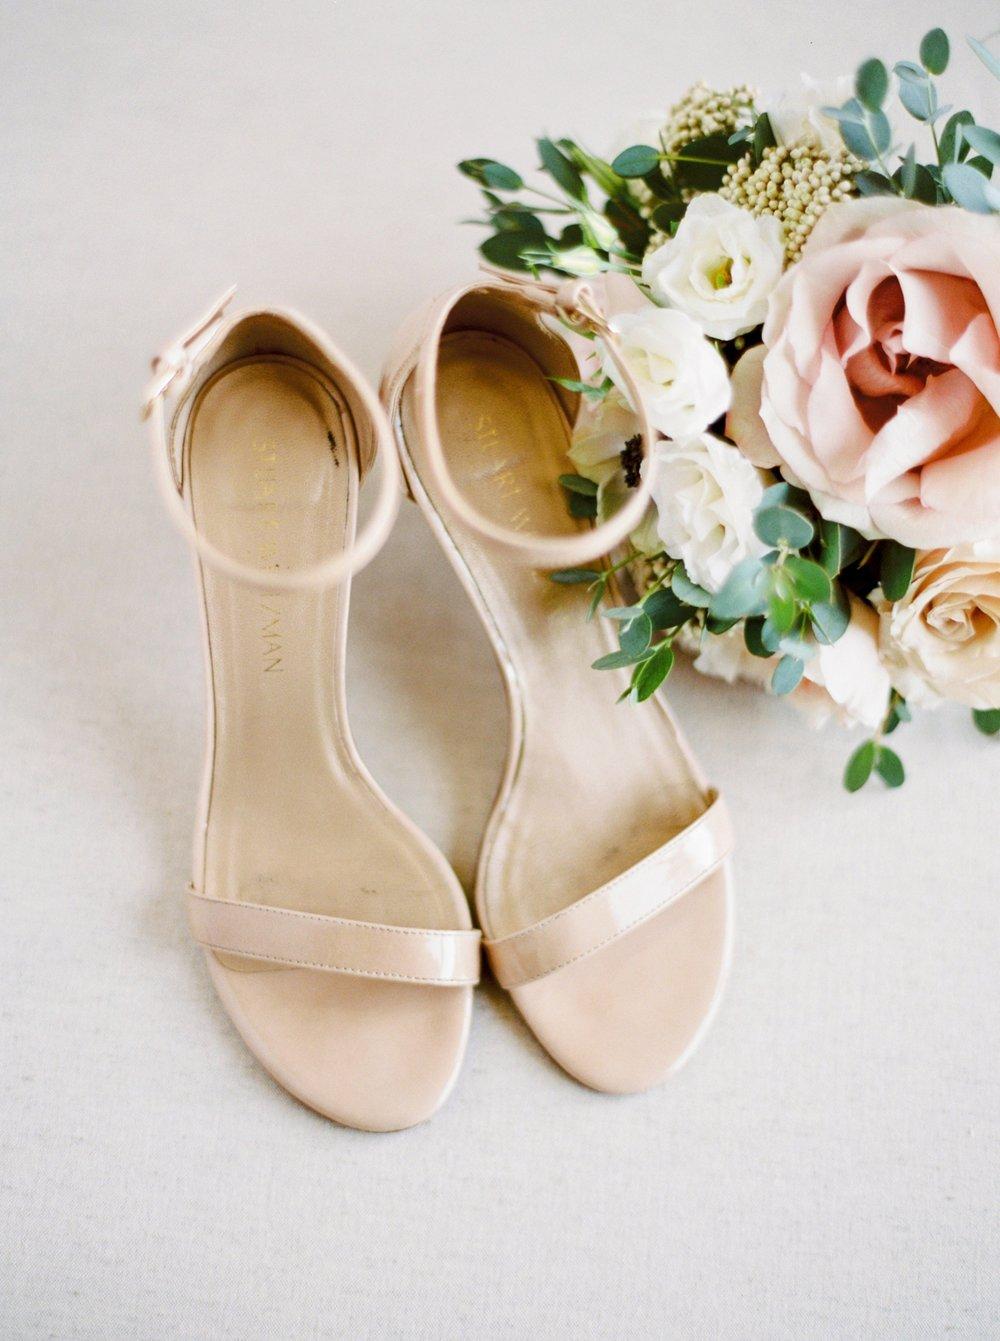 Kelowna wedding photographers | hotel eldorado wedding photographer | justine milton fine art film photography | adding shoes | wedding details